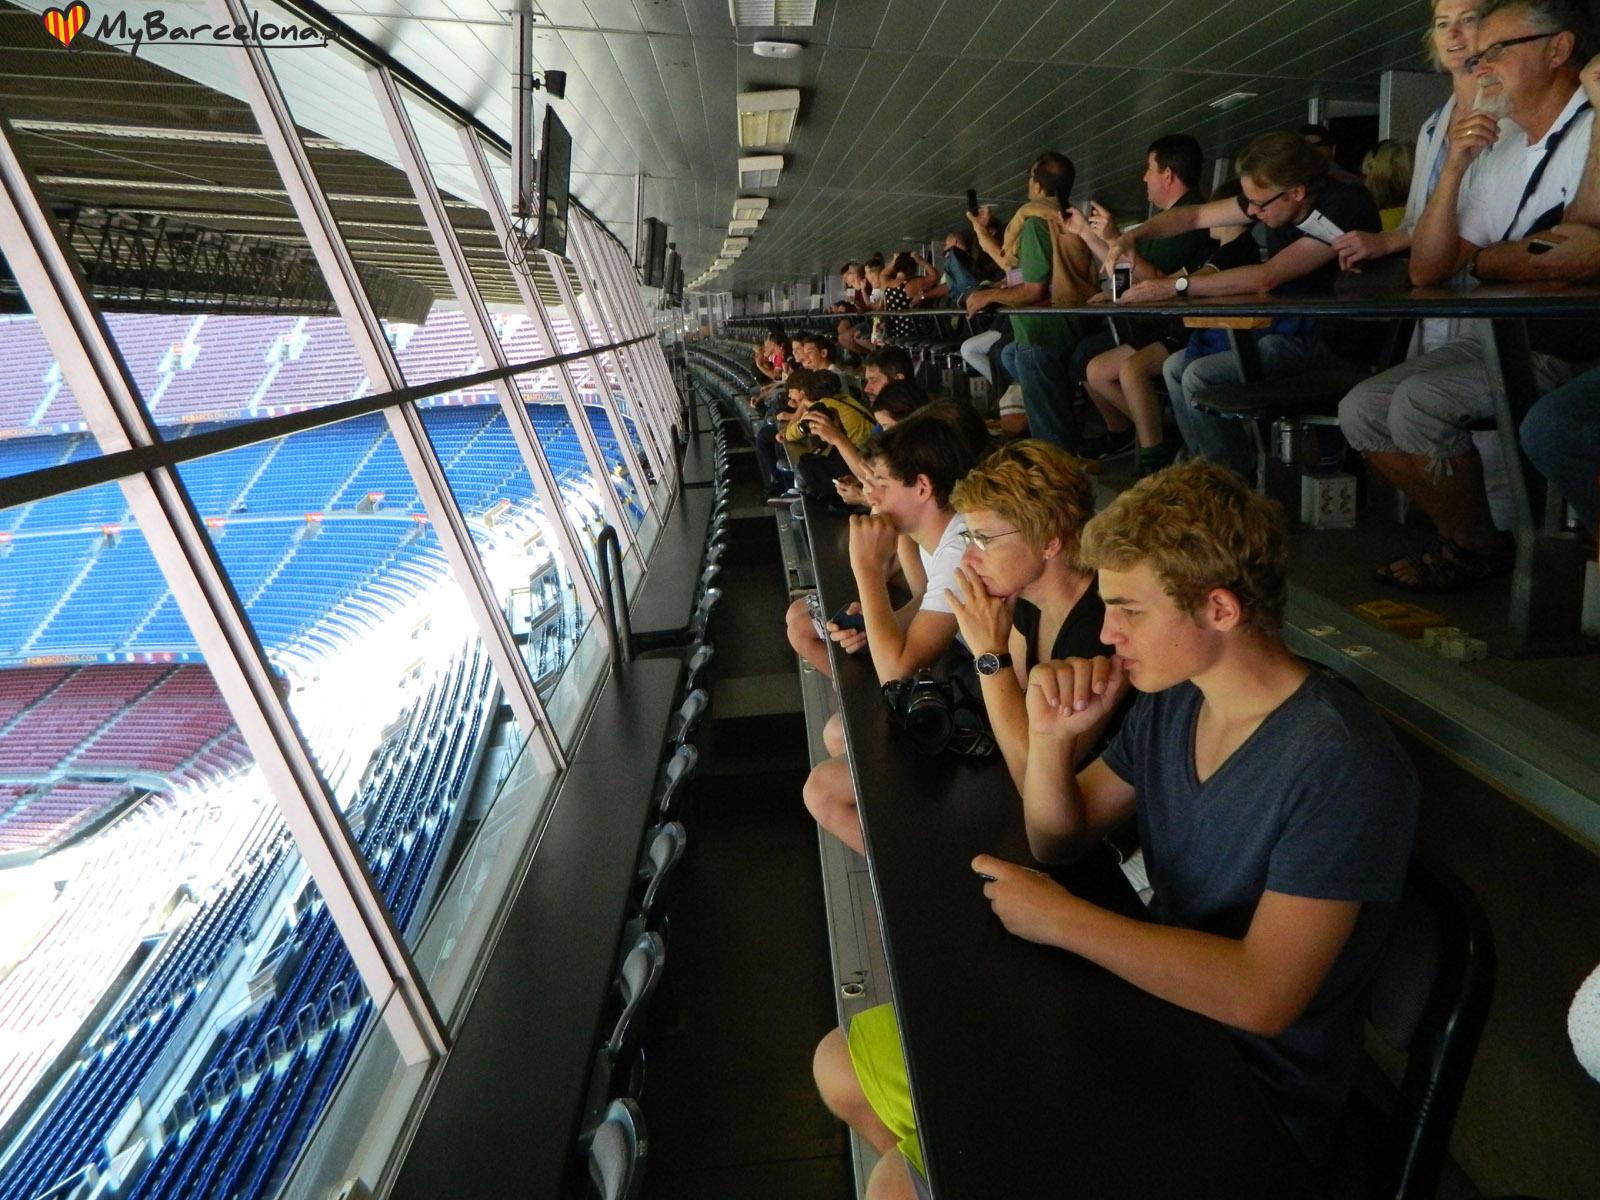 Camp Nou - gniazdo komentatorskie